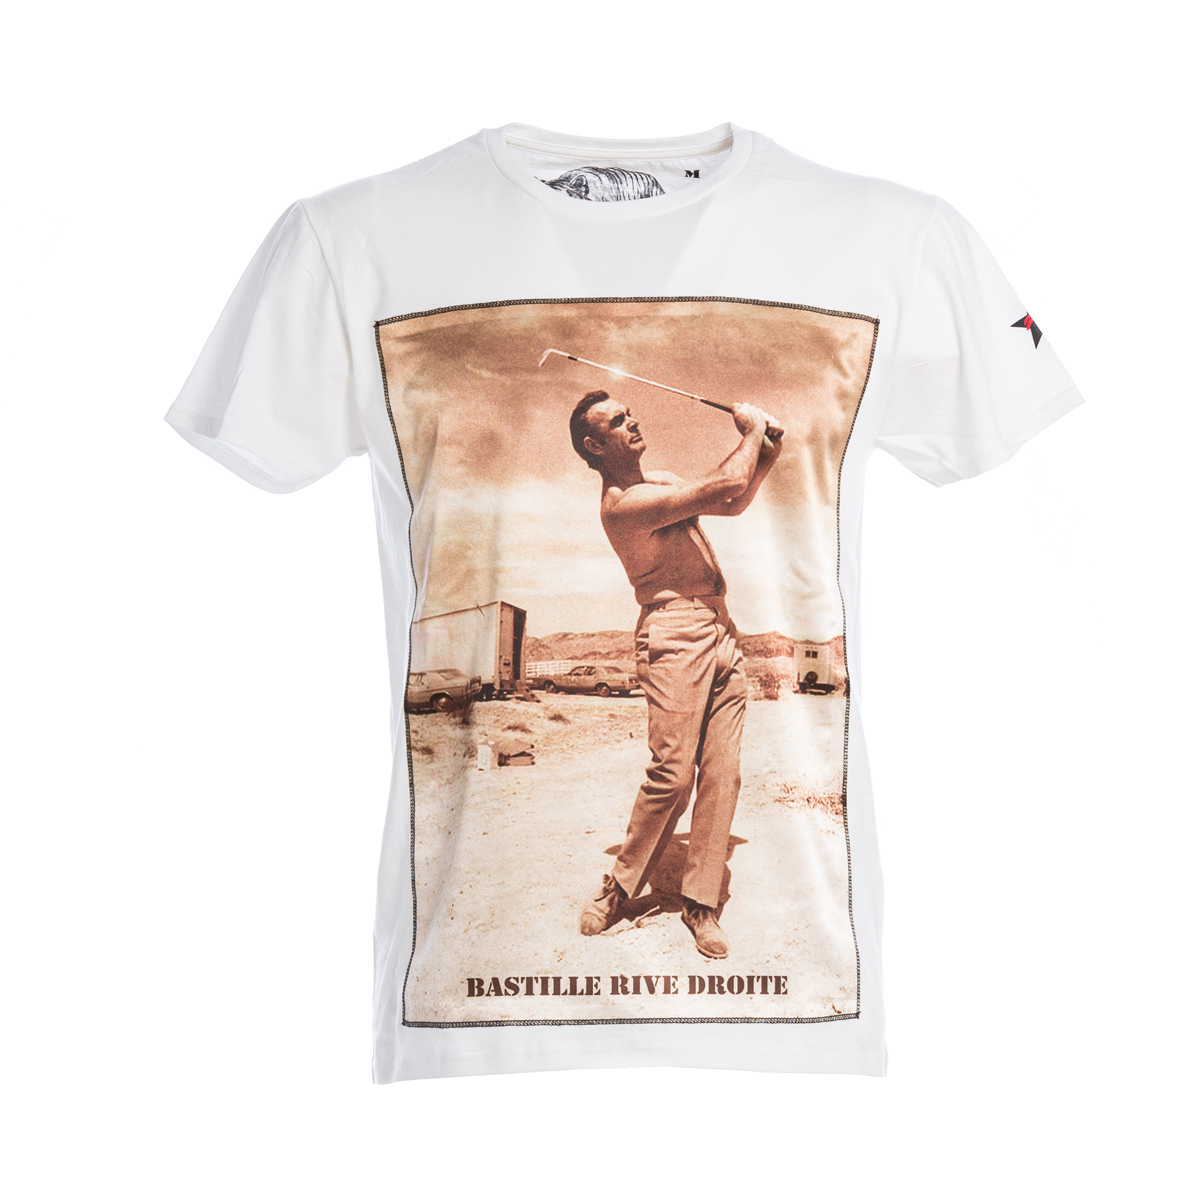 T-Shirt Bastille Bianca Stampa Sean Connery